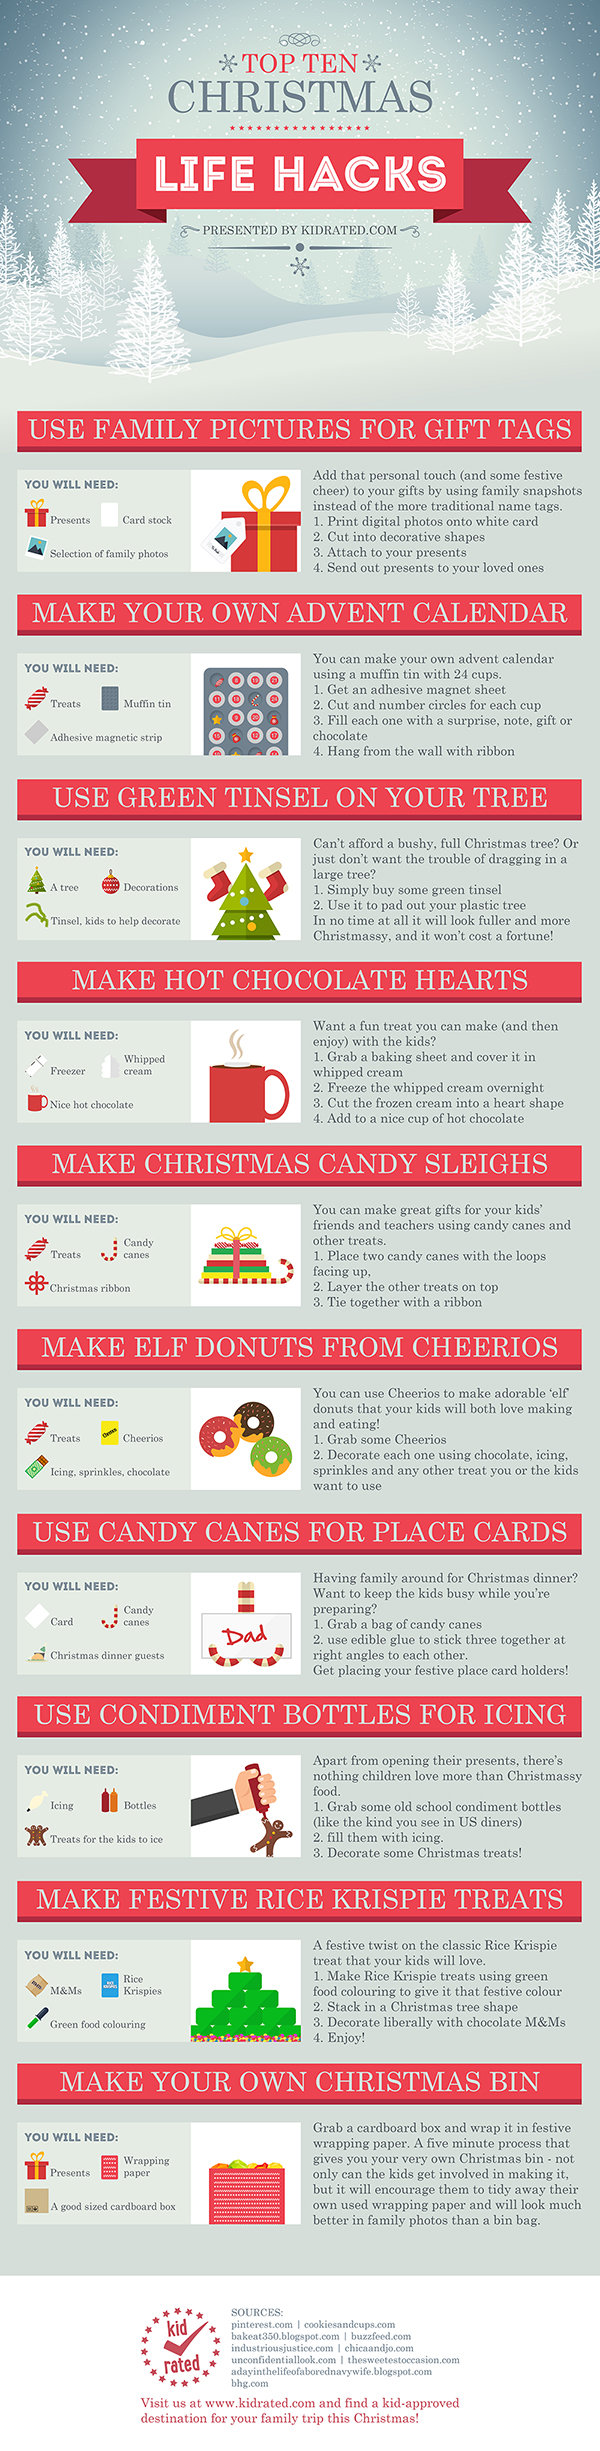 Top Ten Christmas Life Hacks infographic